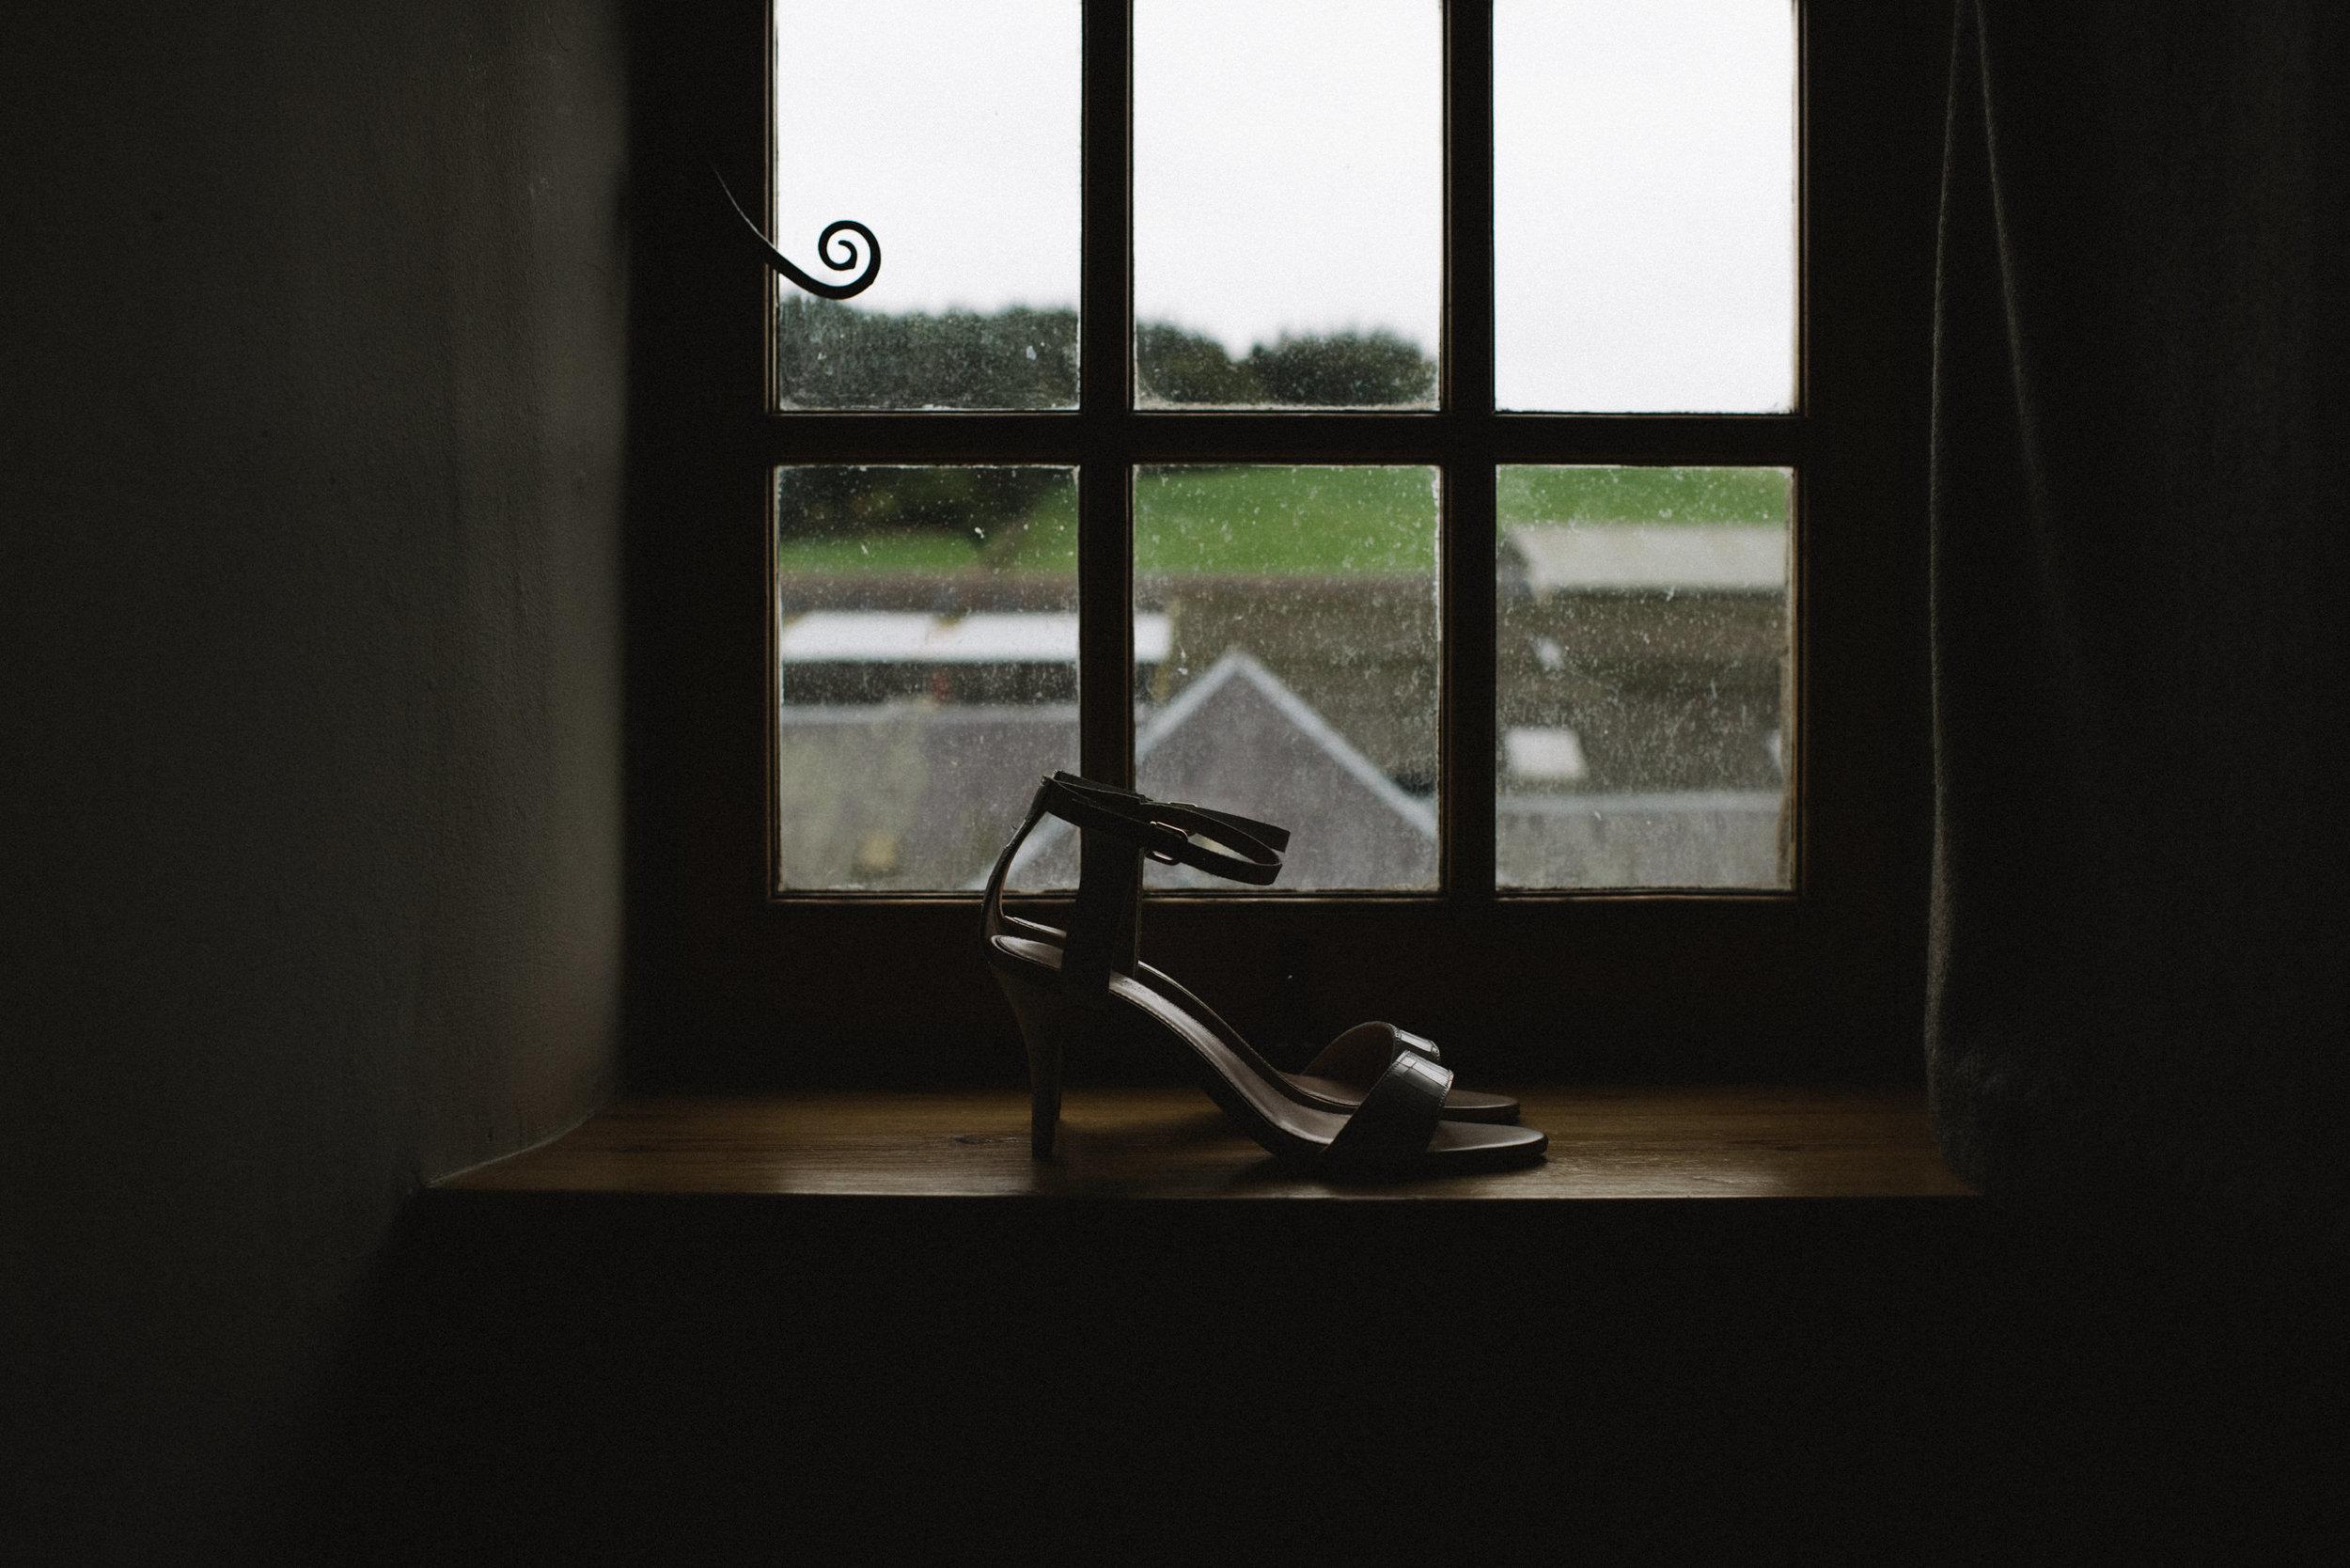 0034-LISA-DEVINE-PHOTOGRAPHY-ALTERNATIVE-WEDDING-PHOTOGRAPHY-SCOTLAND-DESTINATION-WEDDINGS-GLASGOW-WEDDINGS-COOL-WEDDINGS-STYLISH-WEDDINGS.JPG